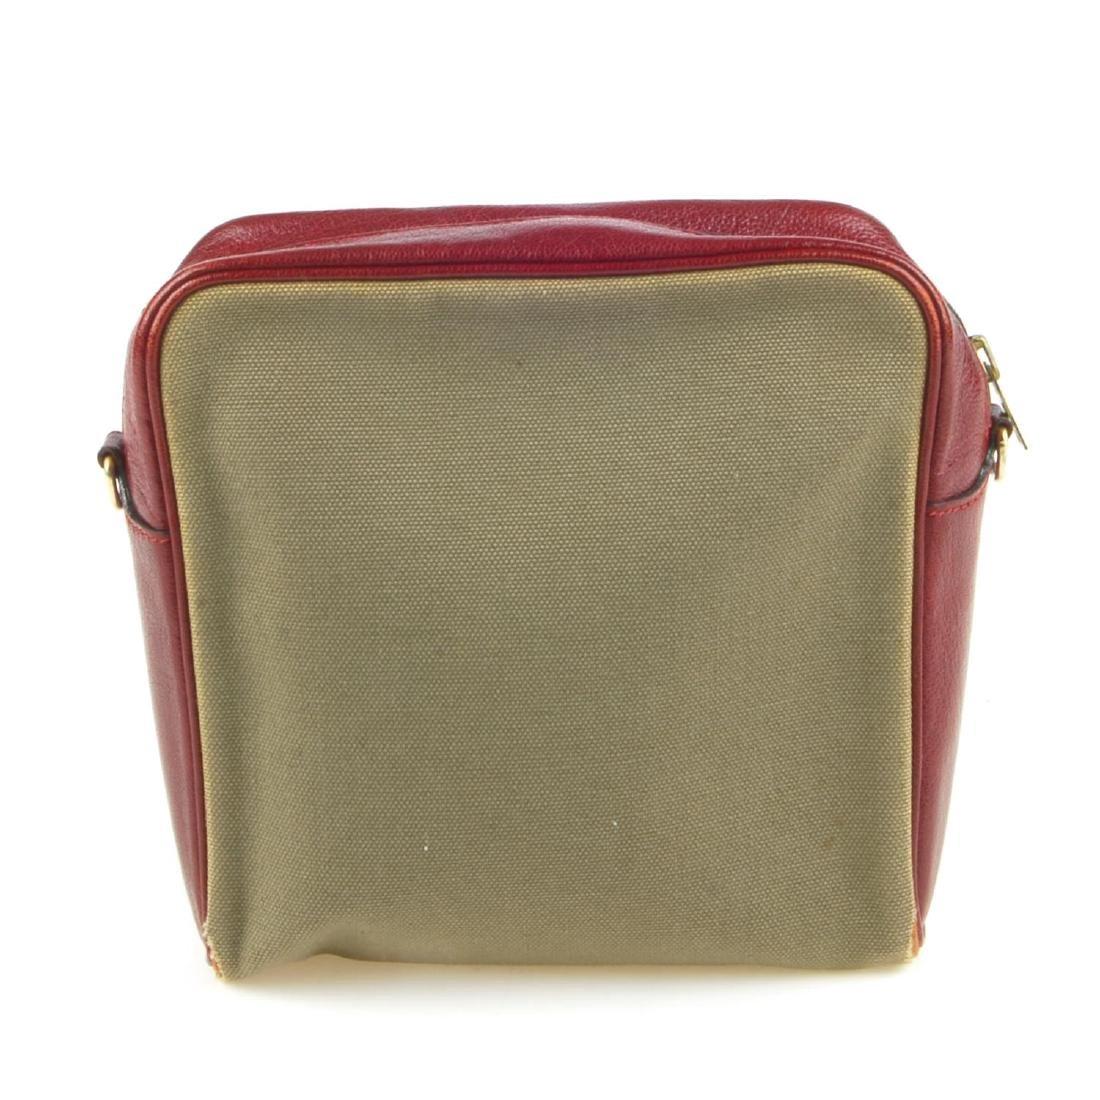 HERMÈS - a small handbag. Crafted from khaki canvas